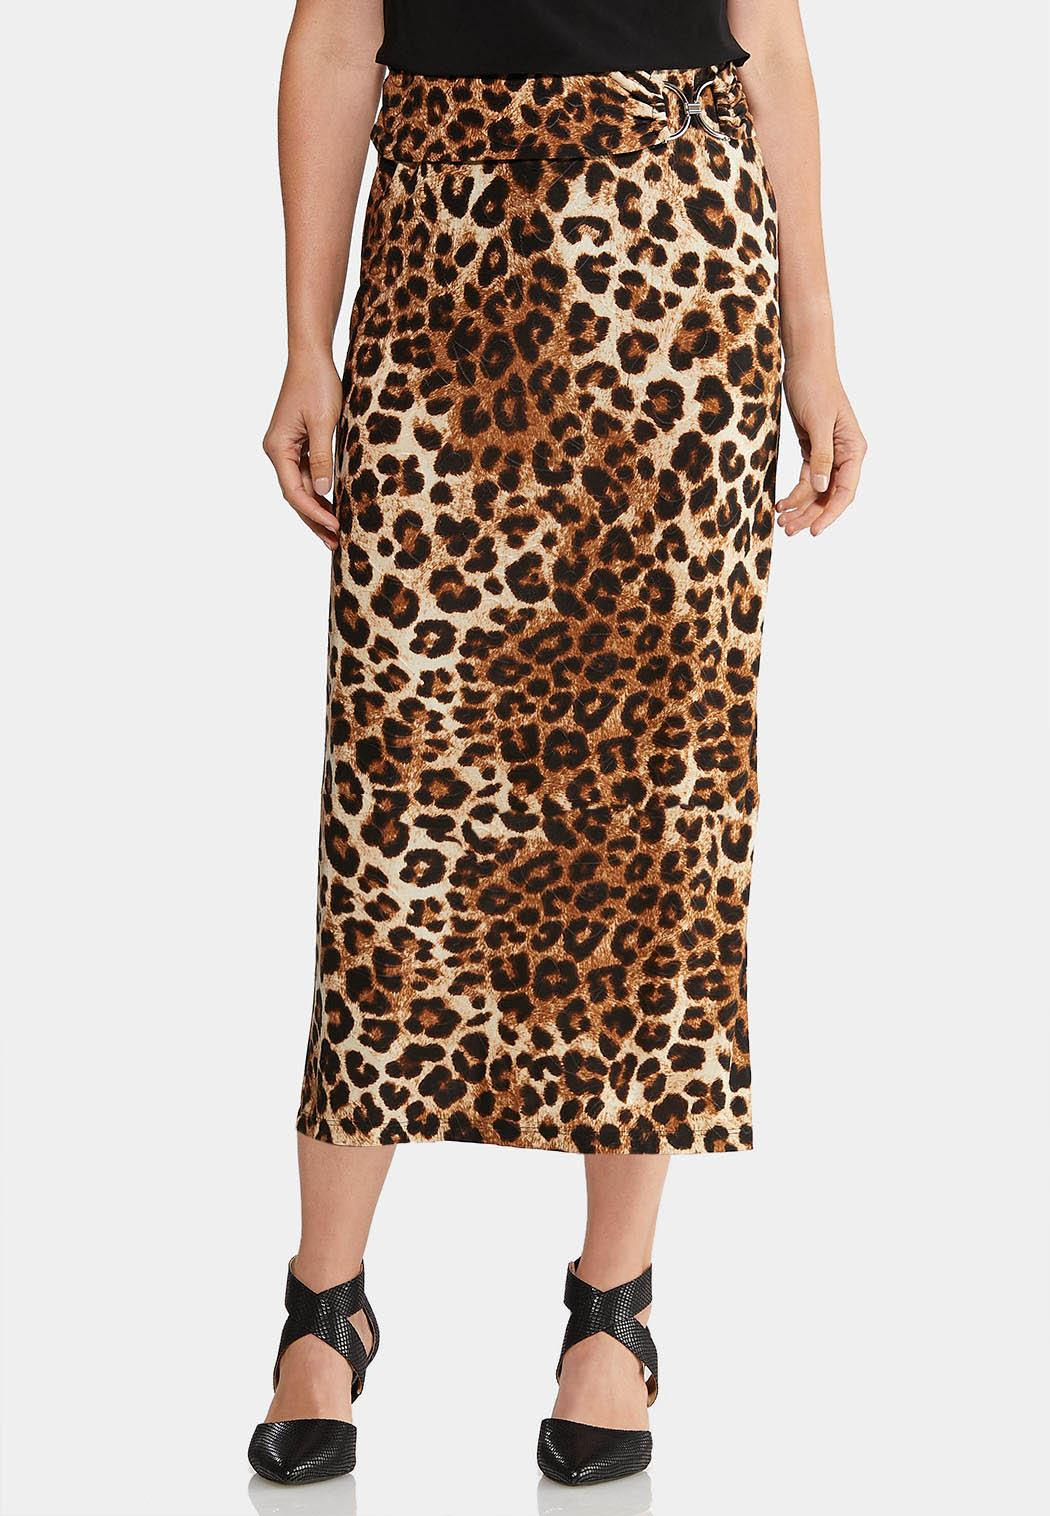 Plus Size Leopard Hardware Skirt